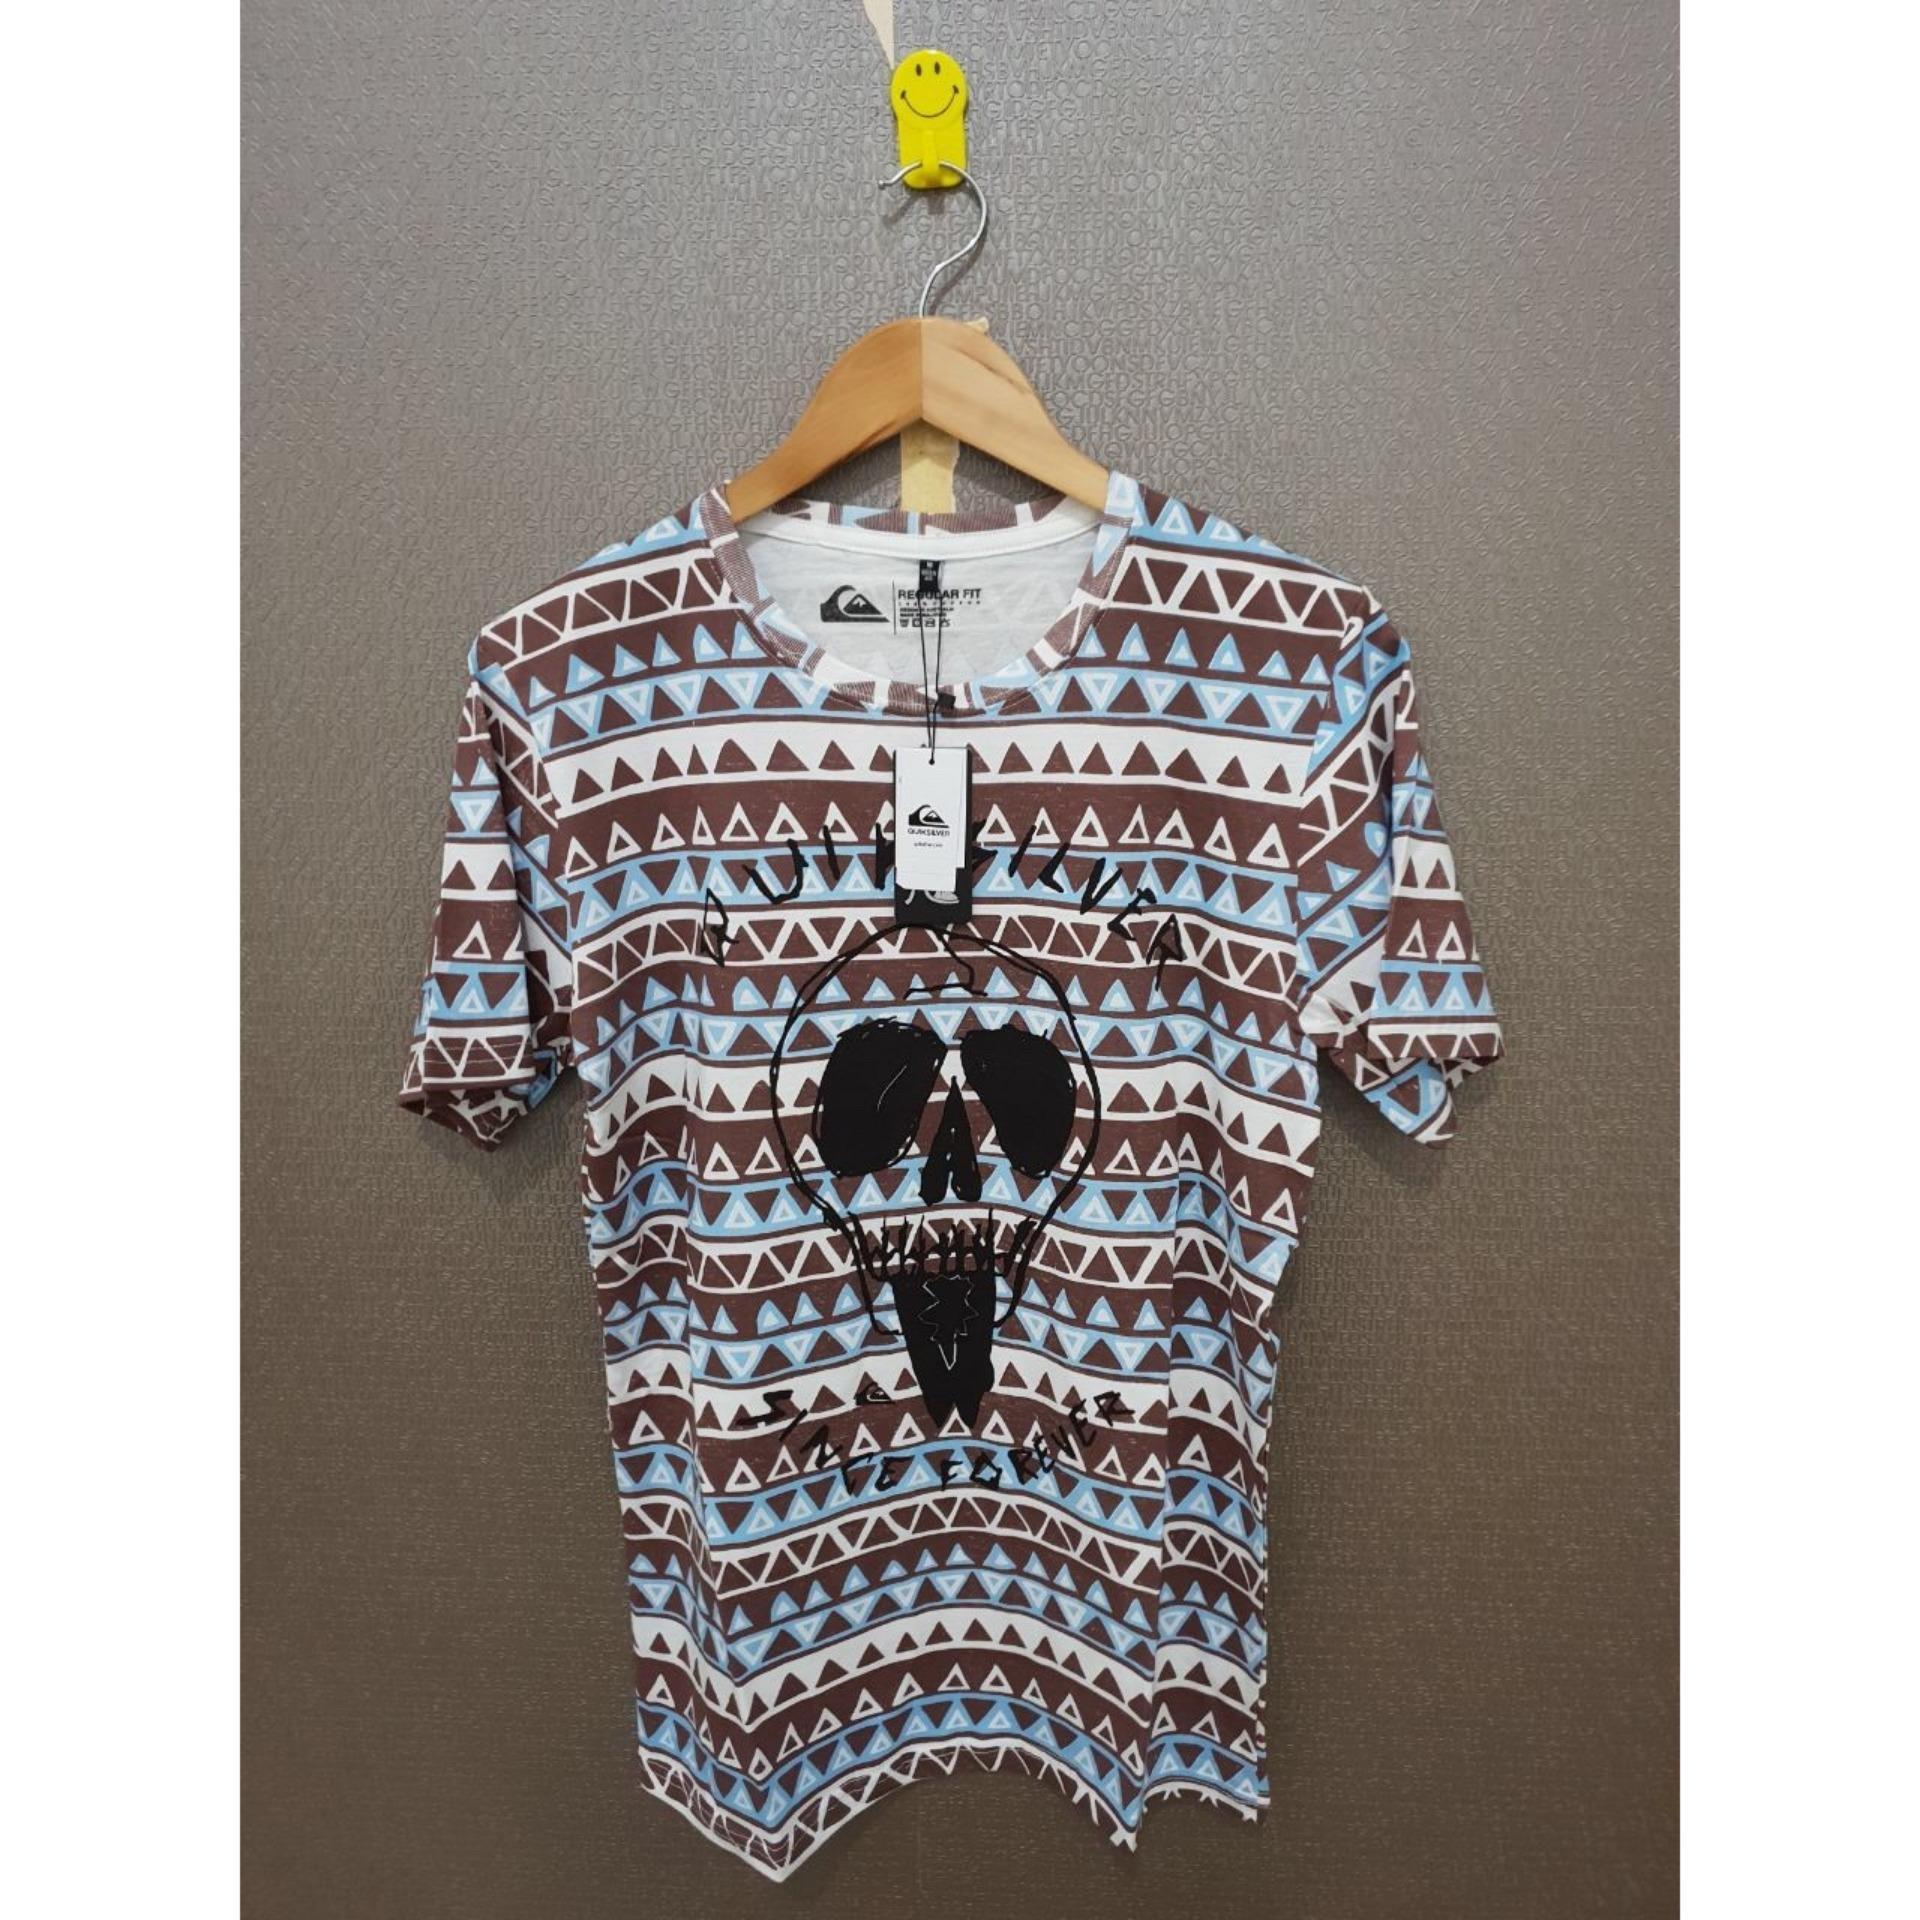 Cek Harga Baru Tshirt Quiksilver Baju Kaos Lengan Panjang Quicksilver Kemeja Original Coklat Distro Surfing E11 C7